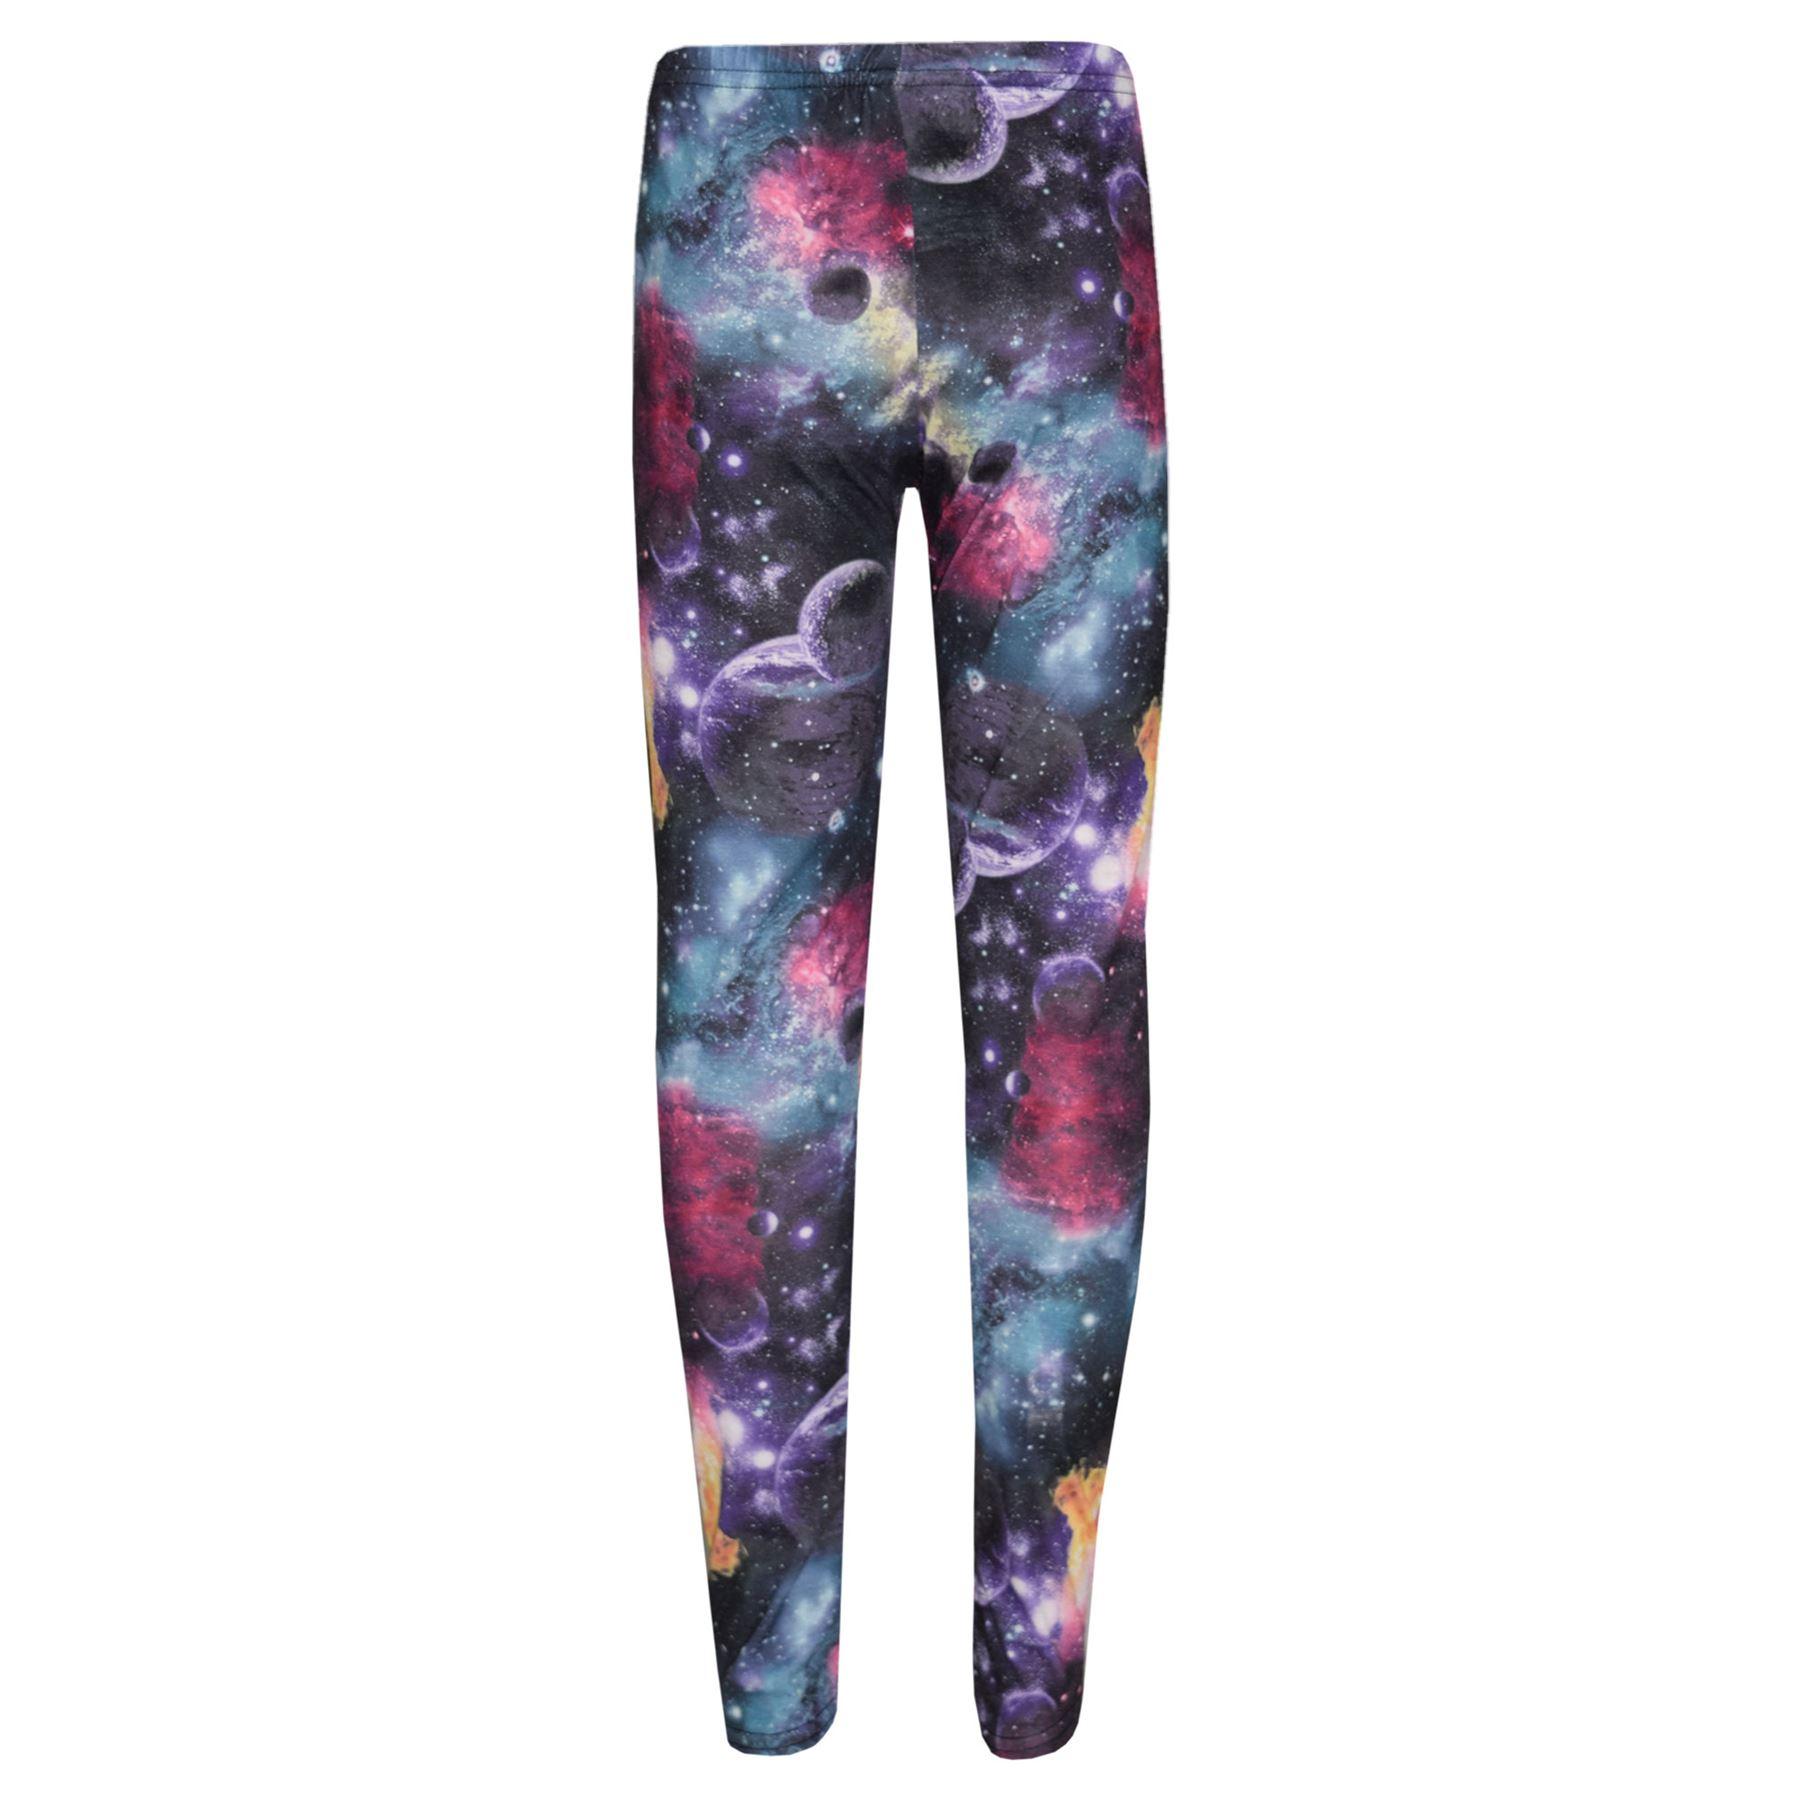 5151649f19a4 Girls Legging Kids Cosmic Print Party Dance Fashion Leggings Pants ...